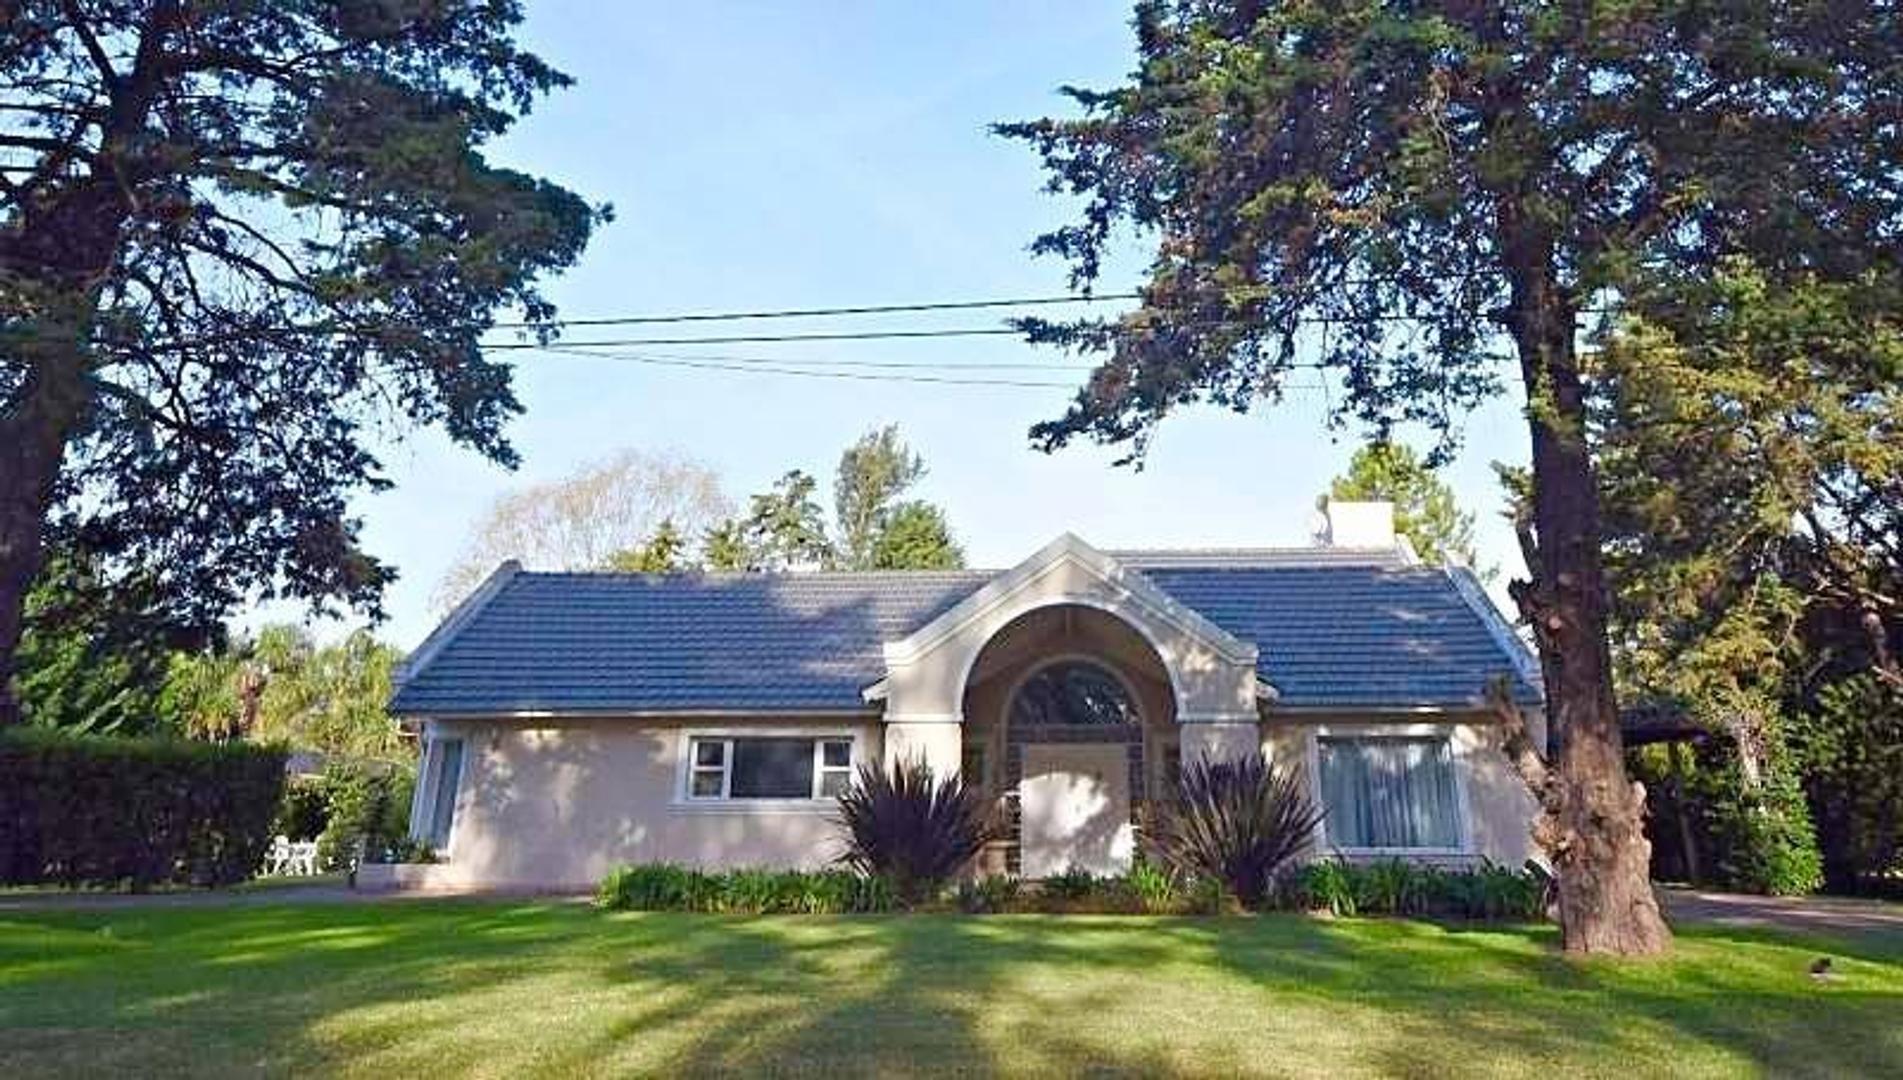 Casa en venta Country San Diego. Impecable